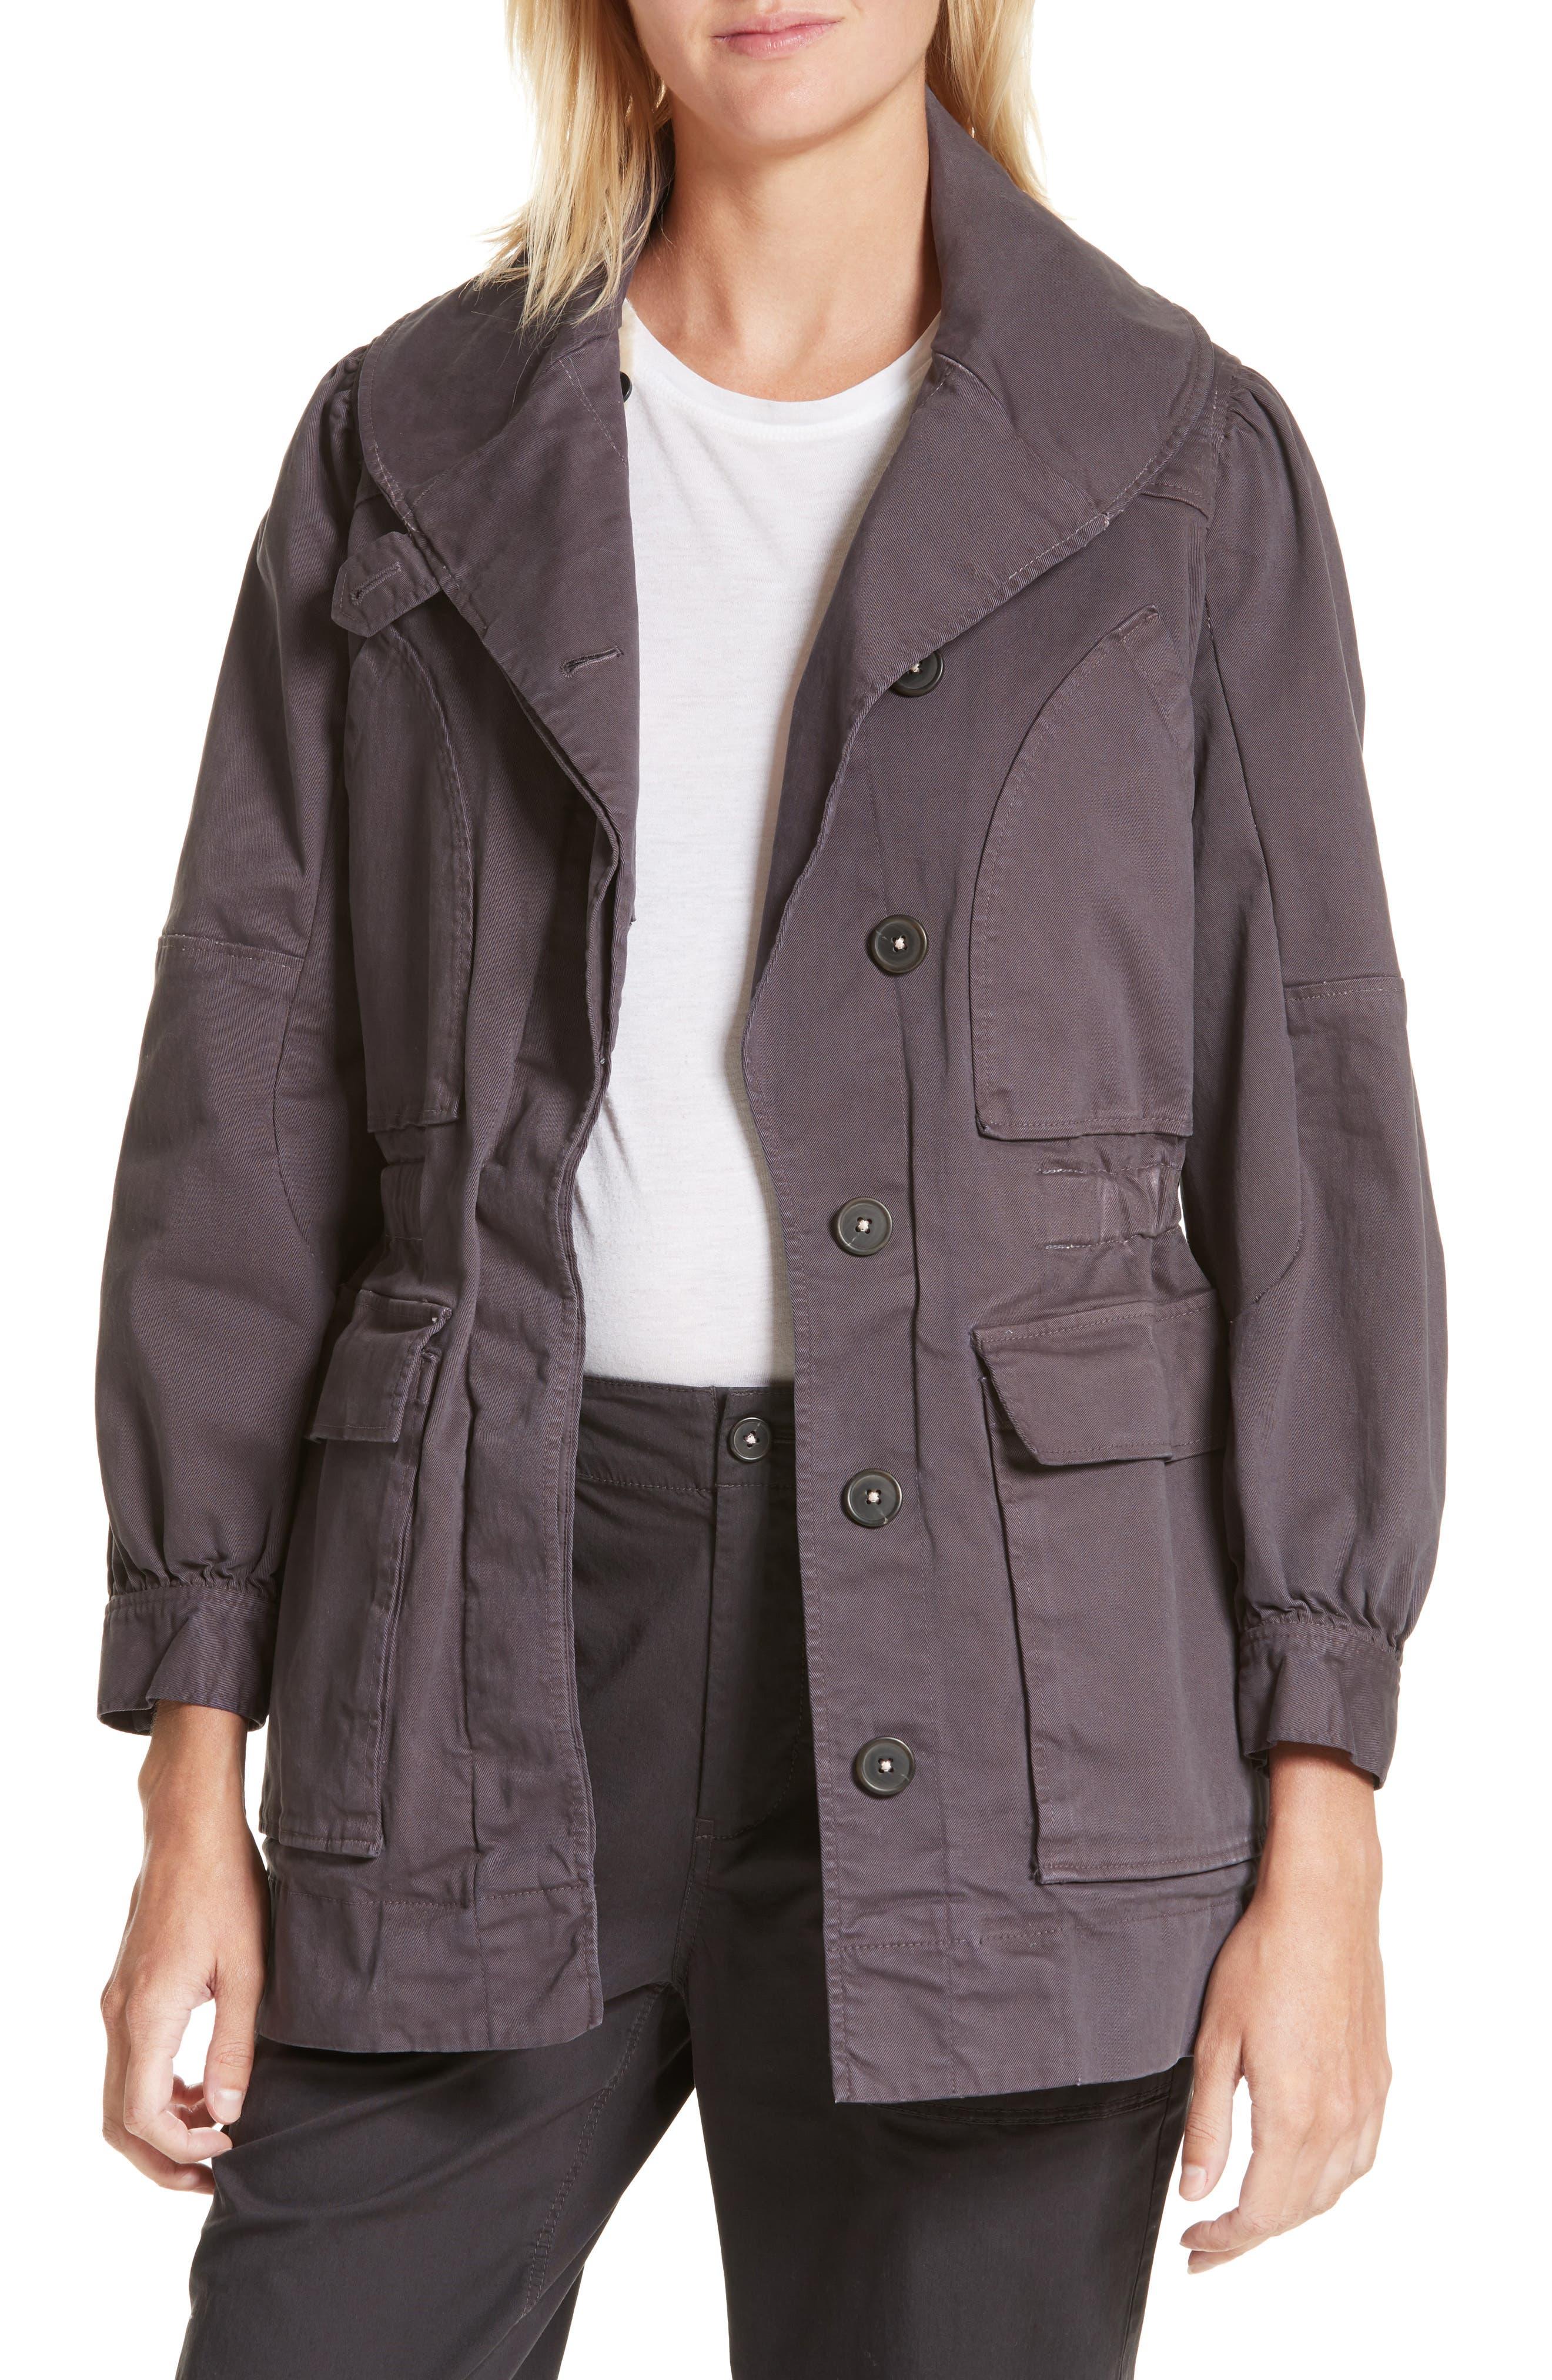 La Vie Rebecca Taylor Twill Utility Jacket